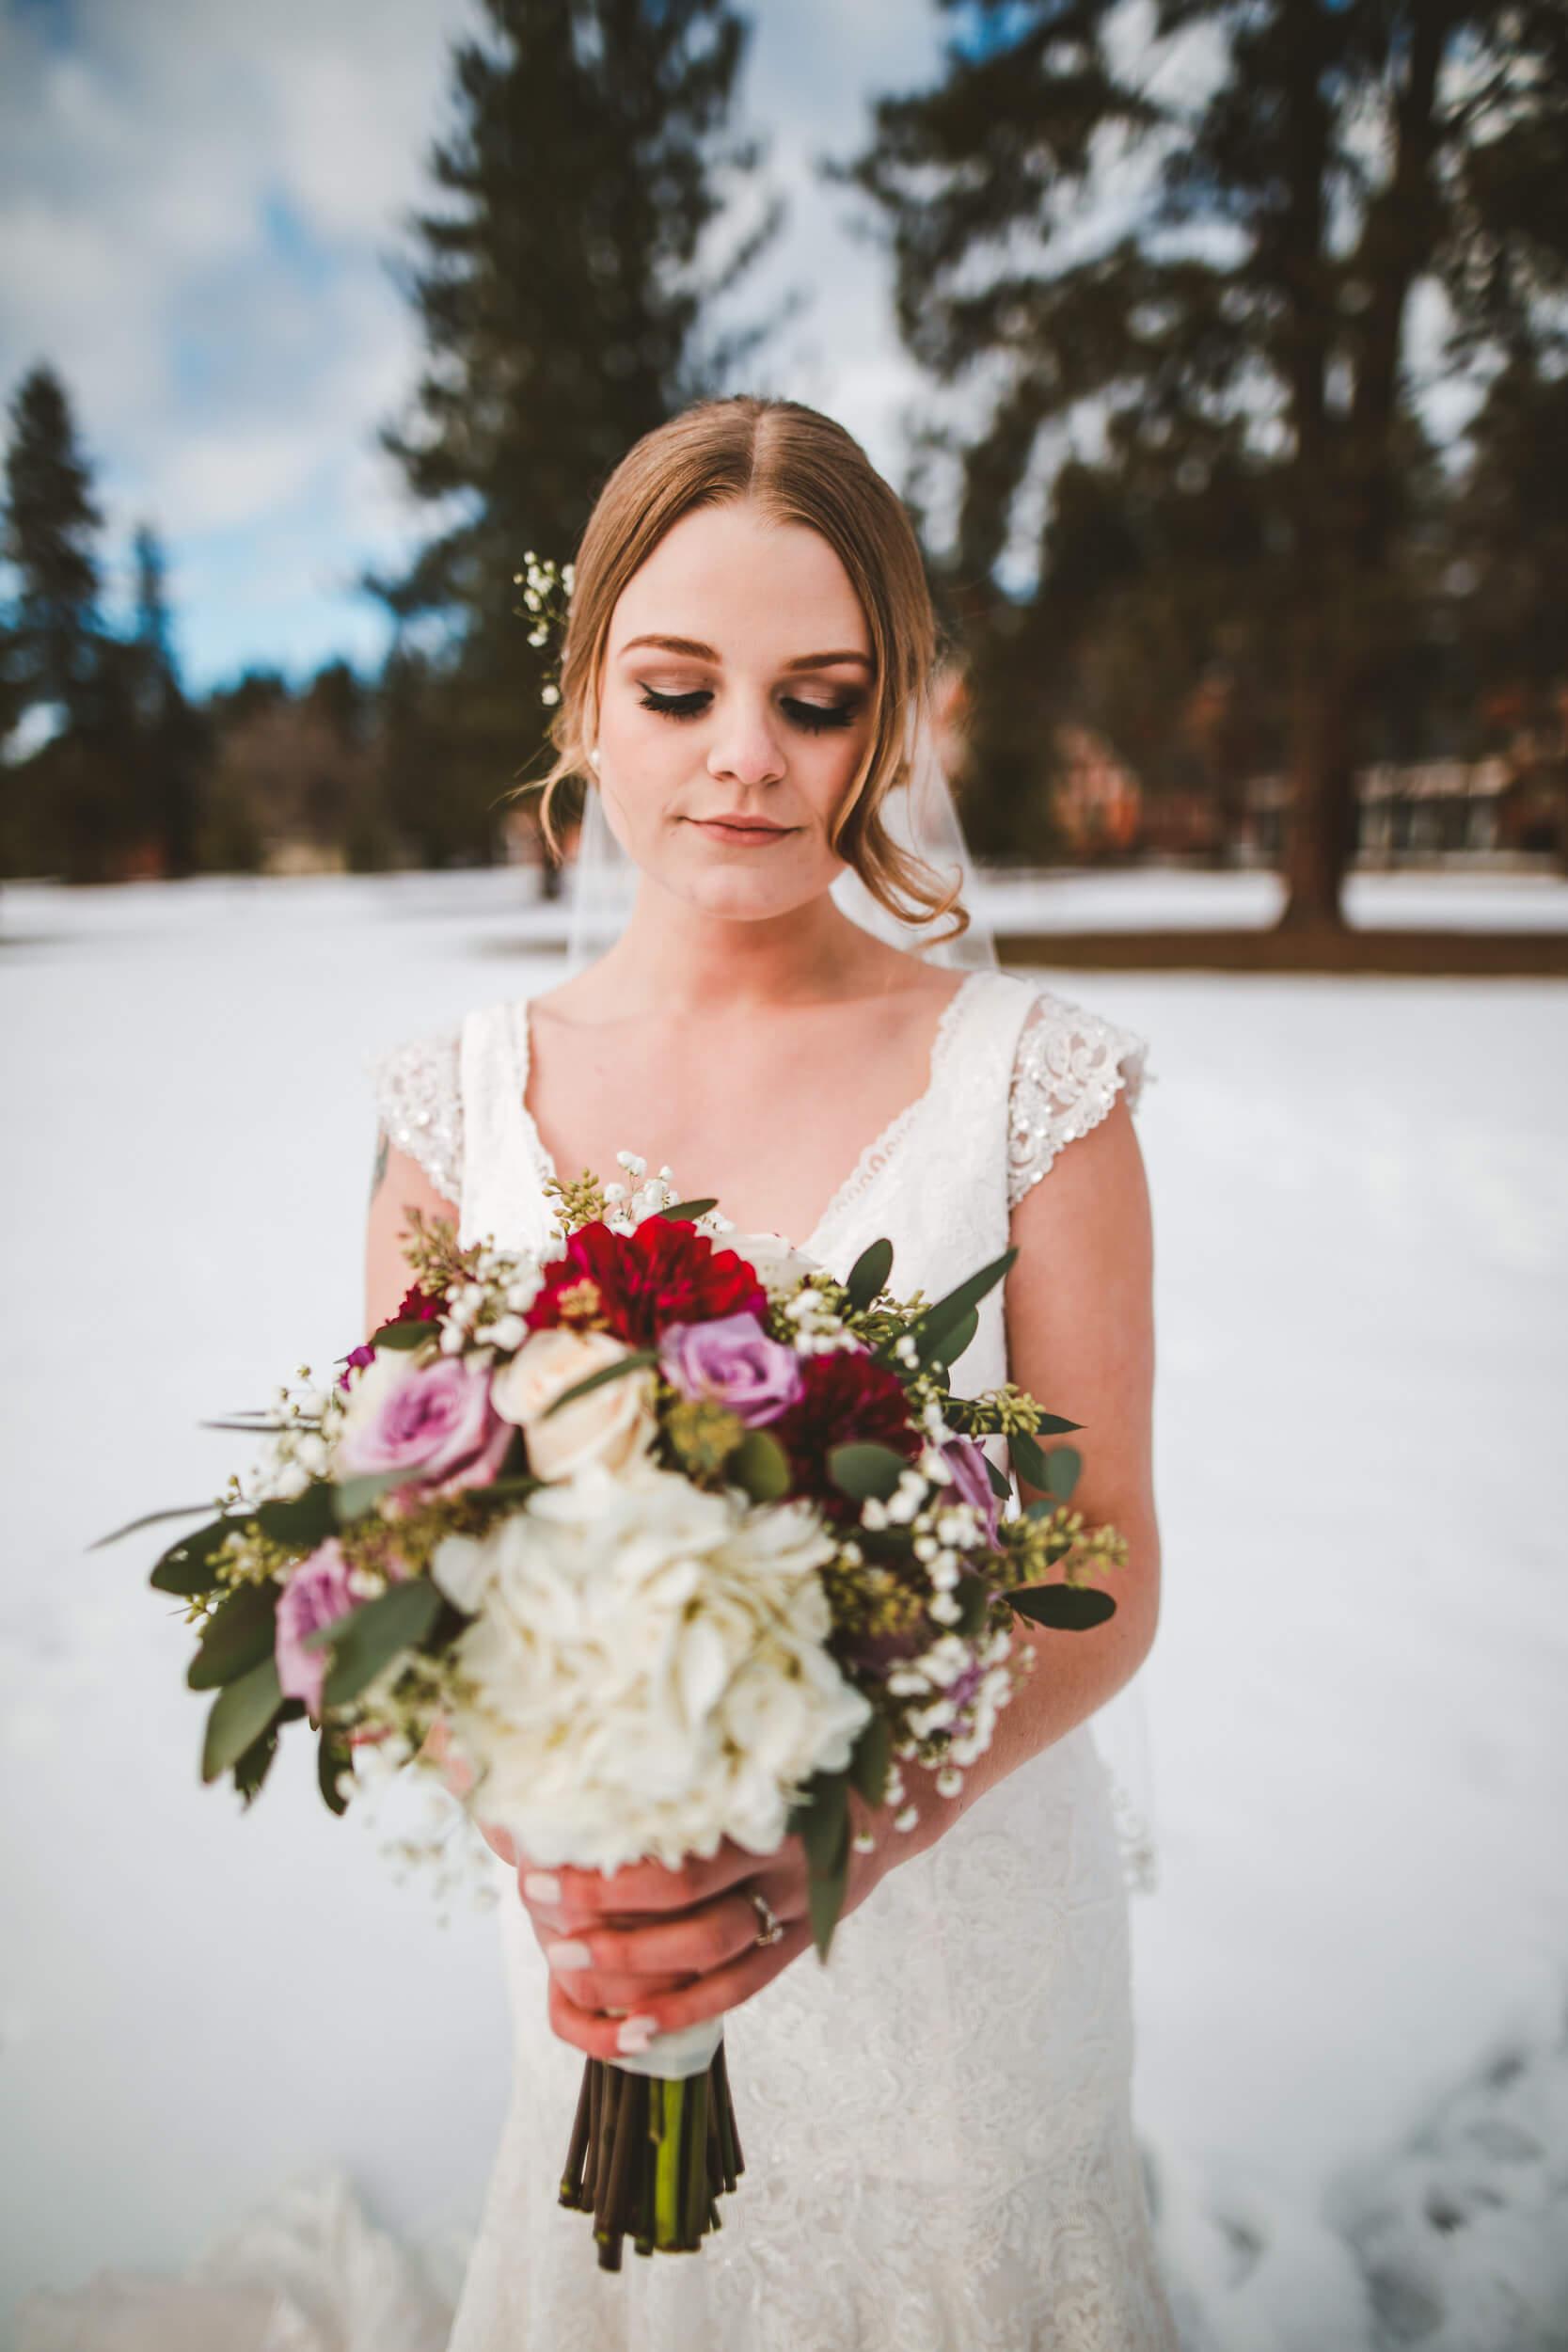 mukogawa winter wedding in spokane (115).jpg